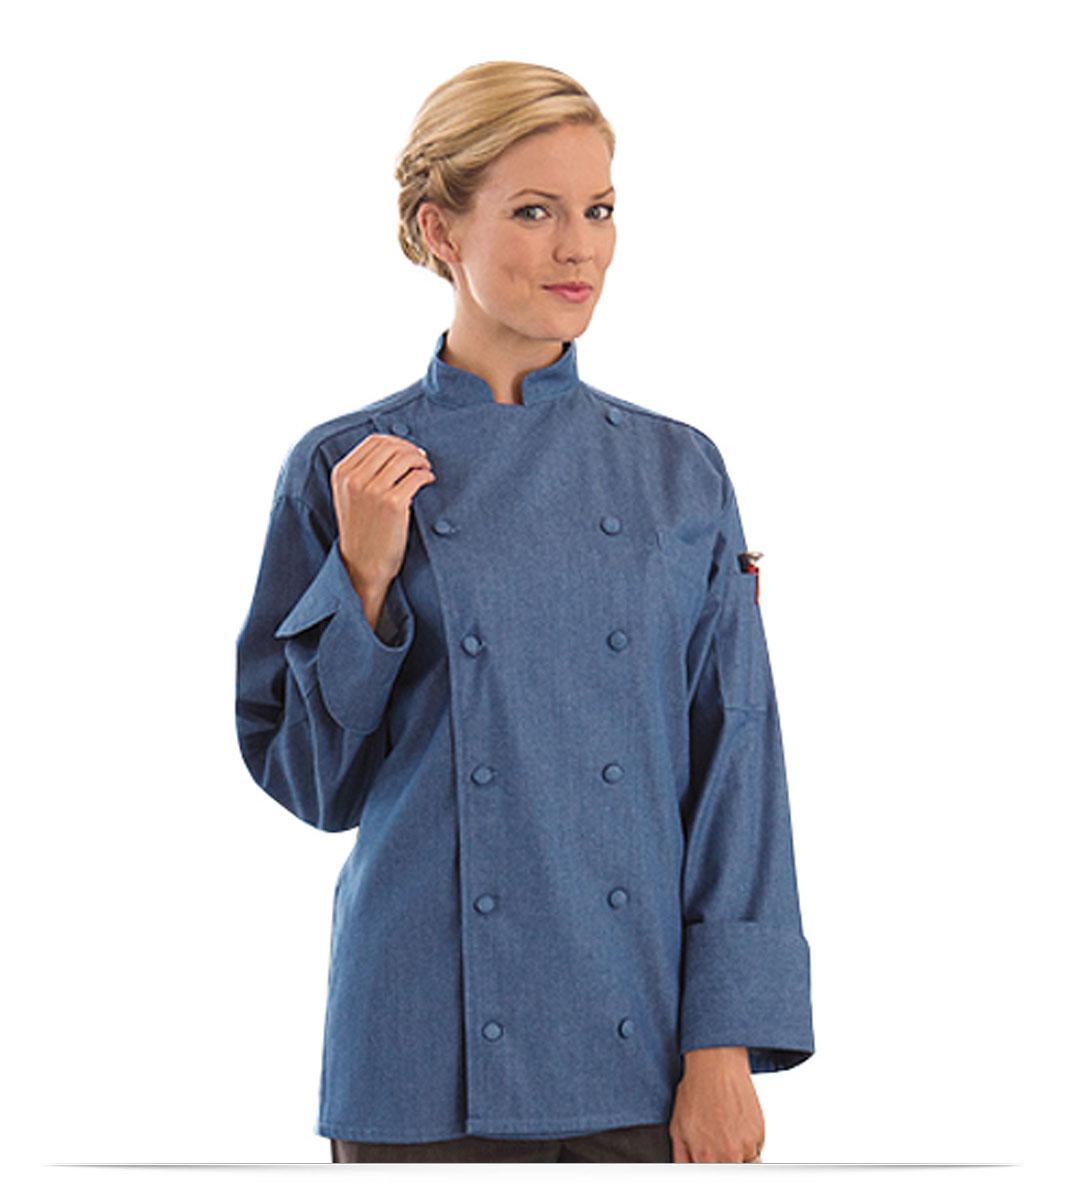 Personalized Chef Jacket Denim